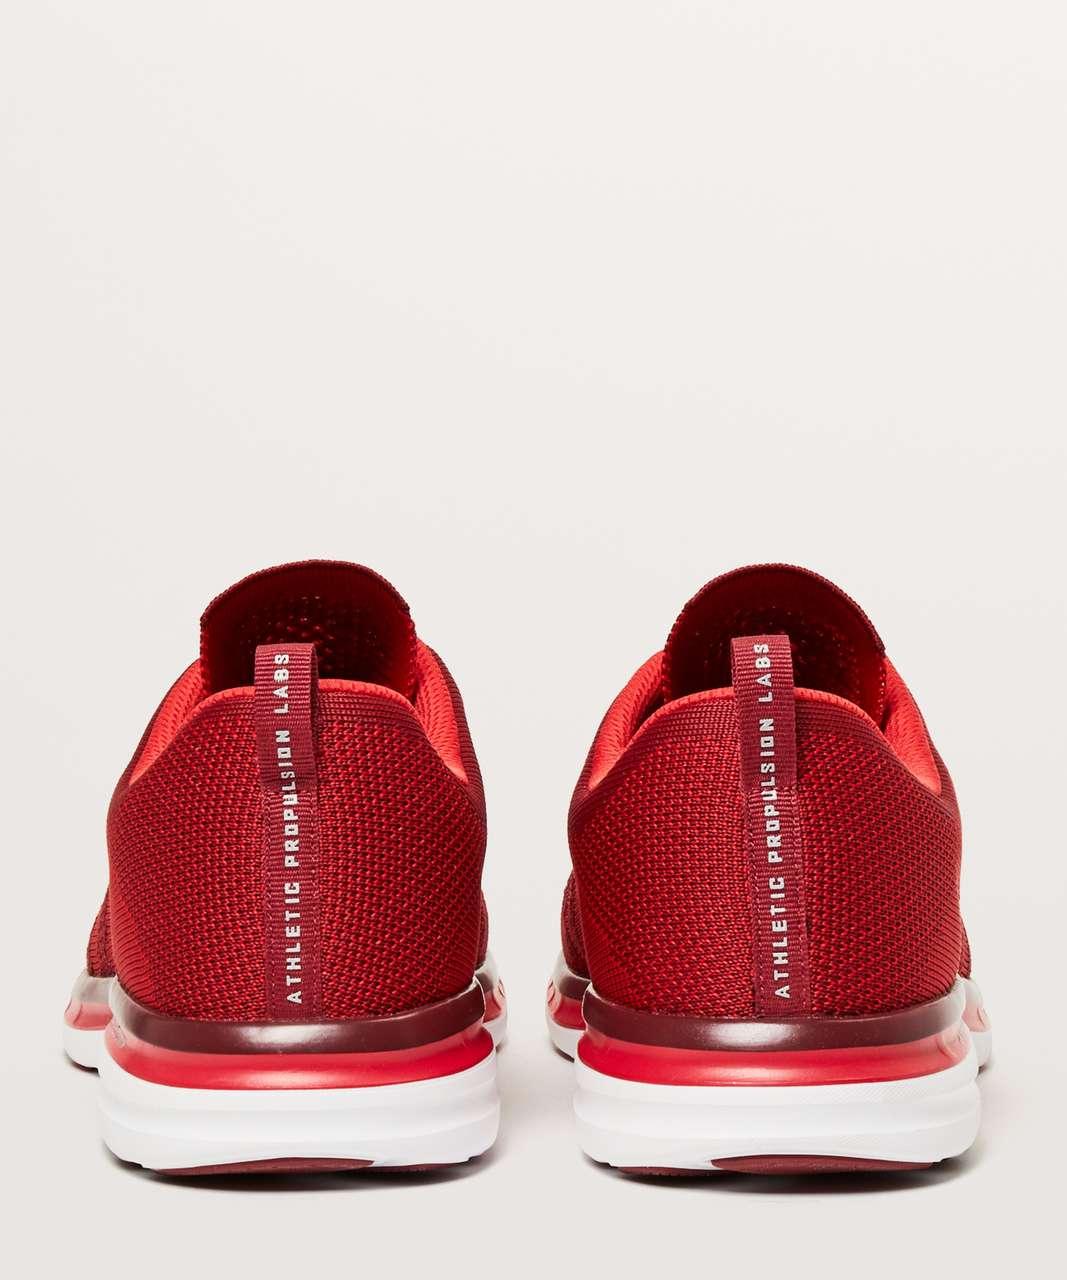 Lululemon Mens TechLoom Pro Shoe - Red / Deep Red